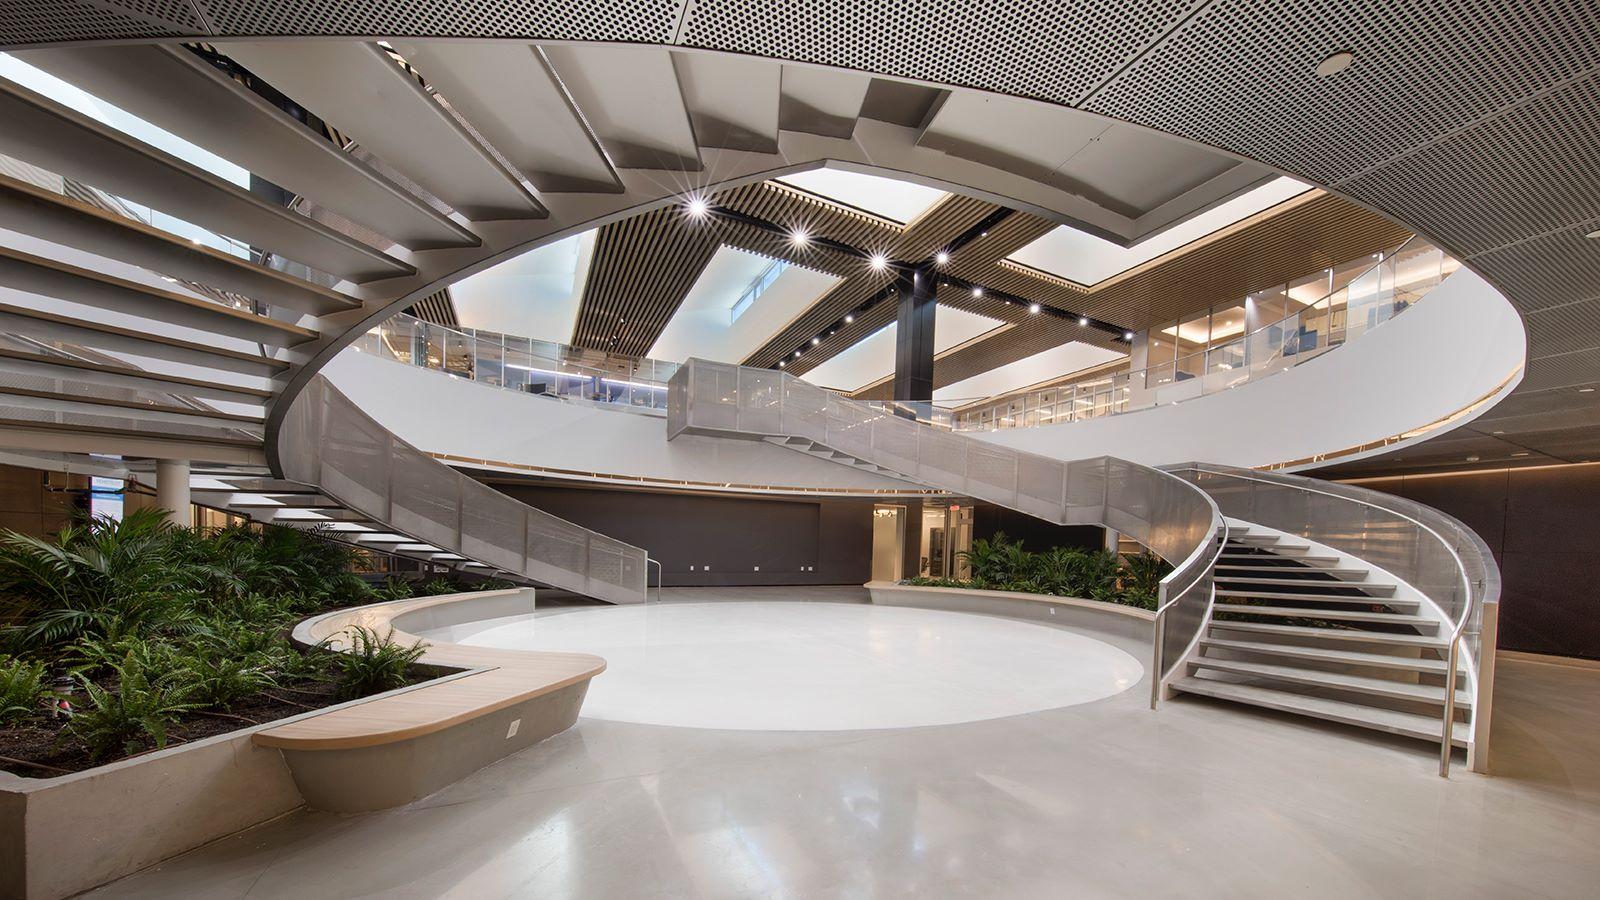 Inside Telemundo Campus, Luxury Modern Stairs - Mace Group